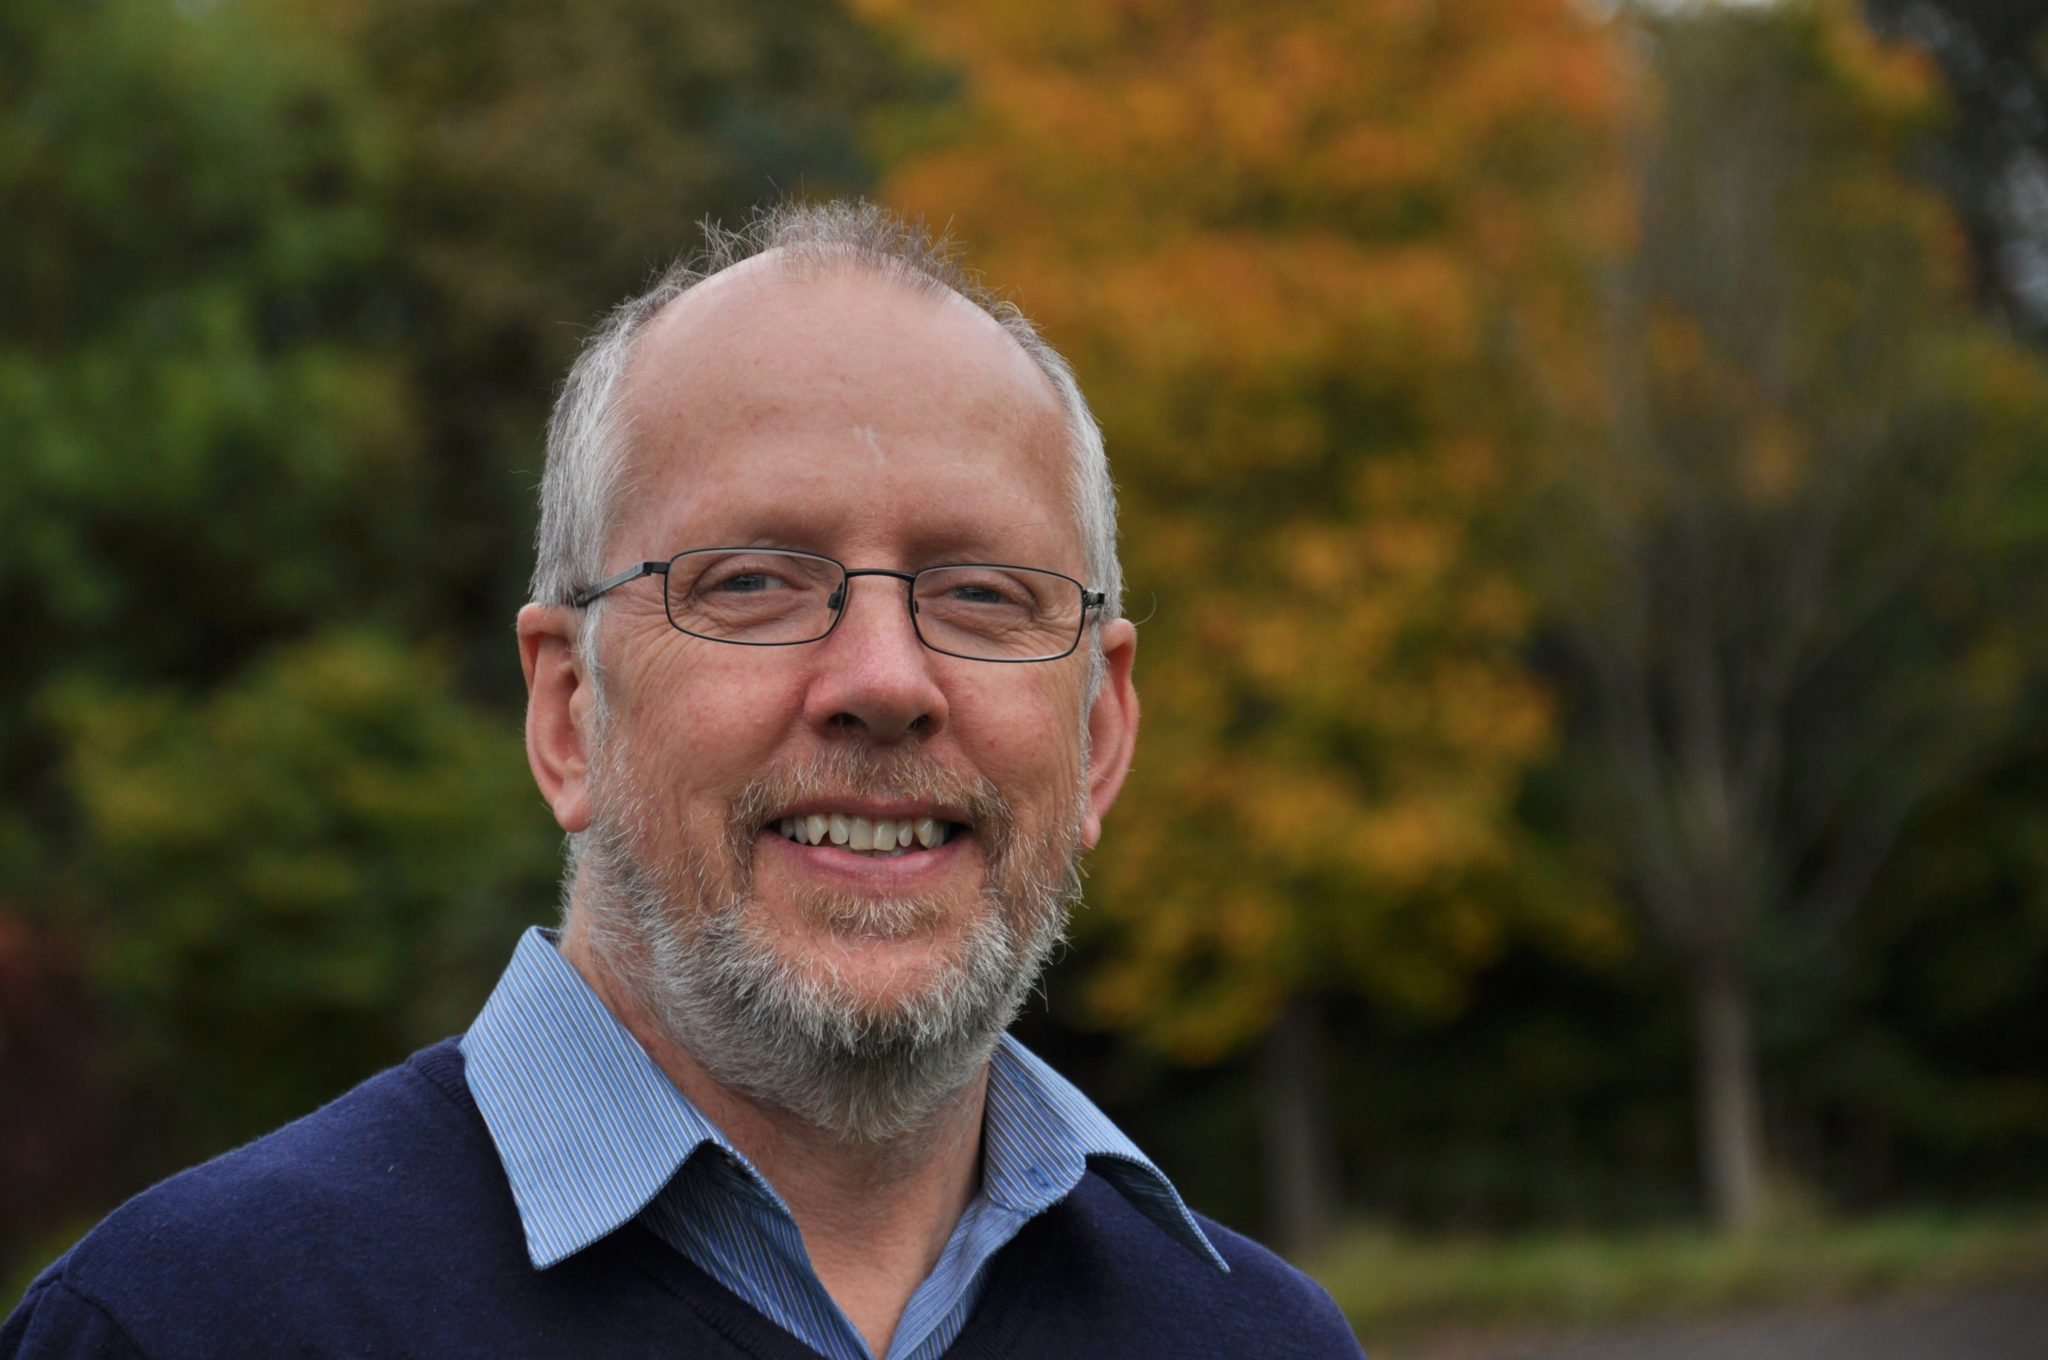 David Brown, Joint Managing Director, Bluebox Avionics Ltd. Image: Bluebox Avionics Ltd.